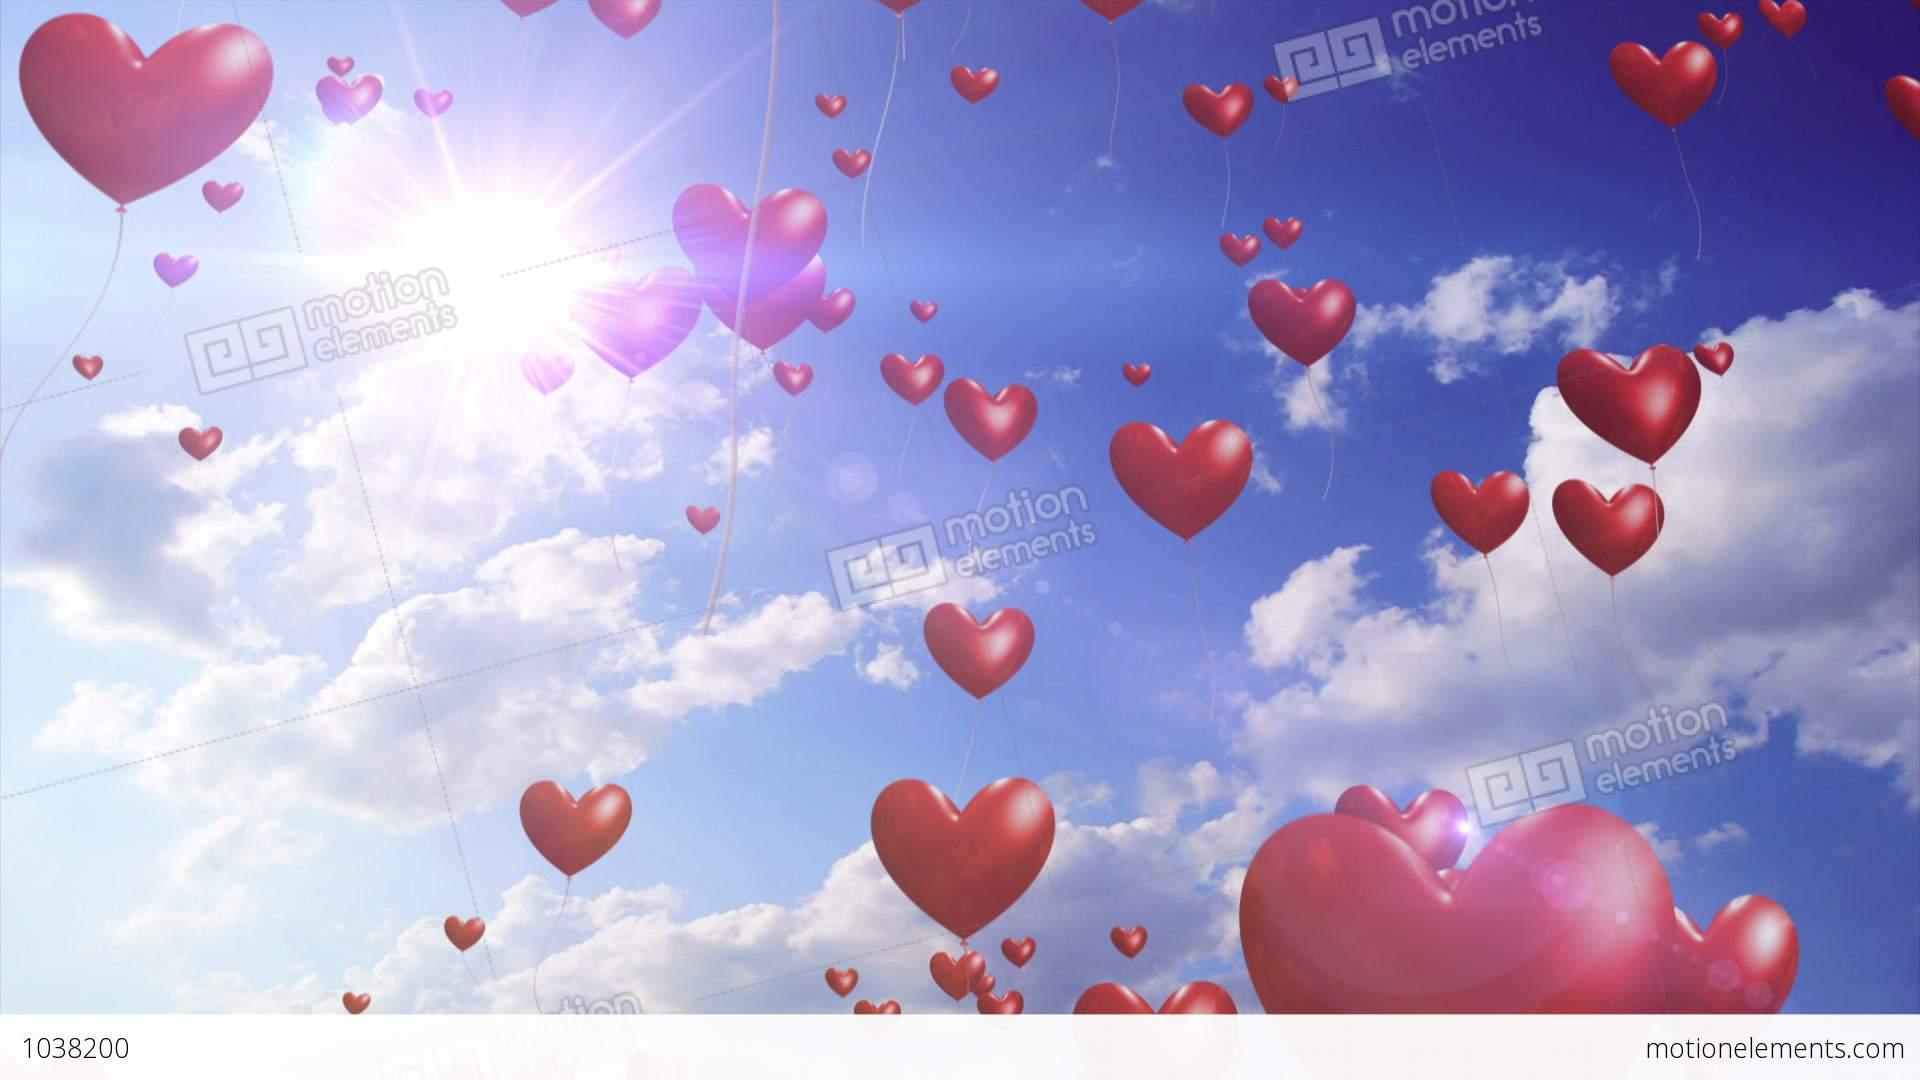 desktop wallpaper valentine heart balloons - photo #20